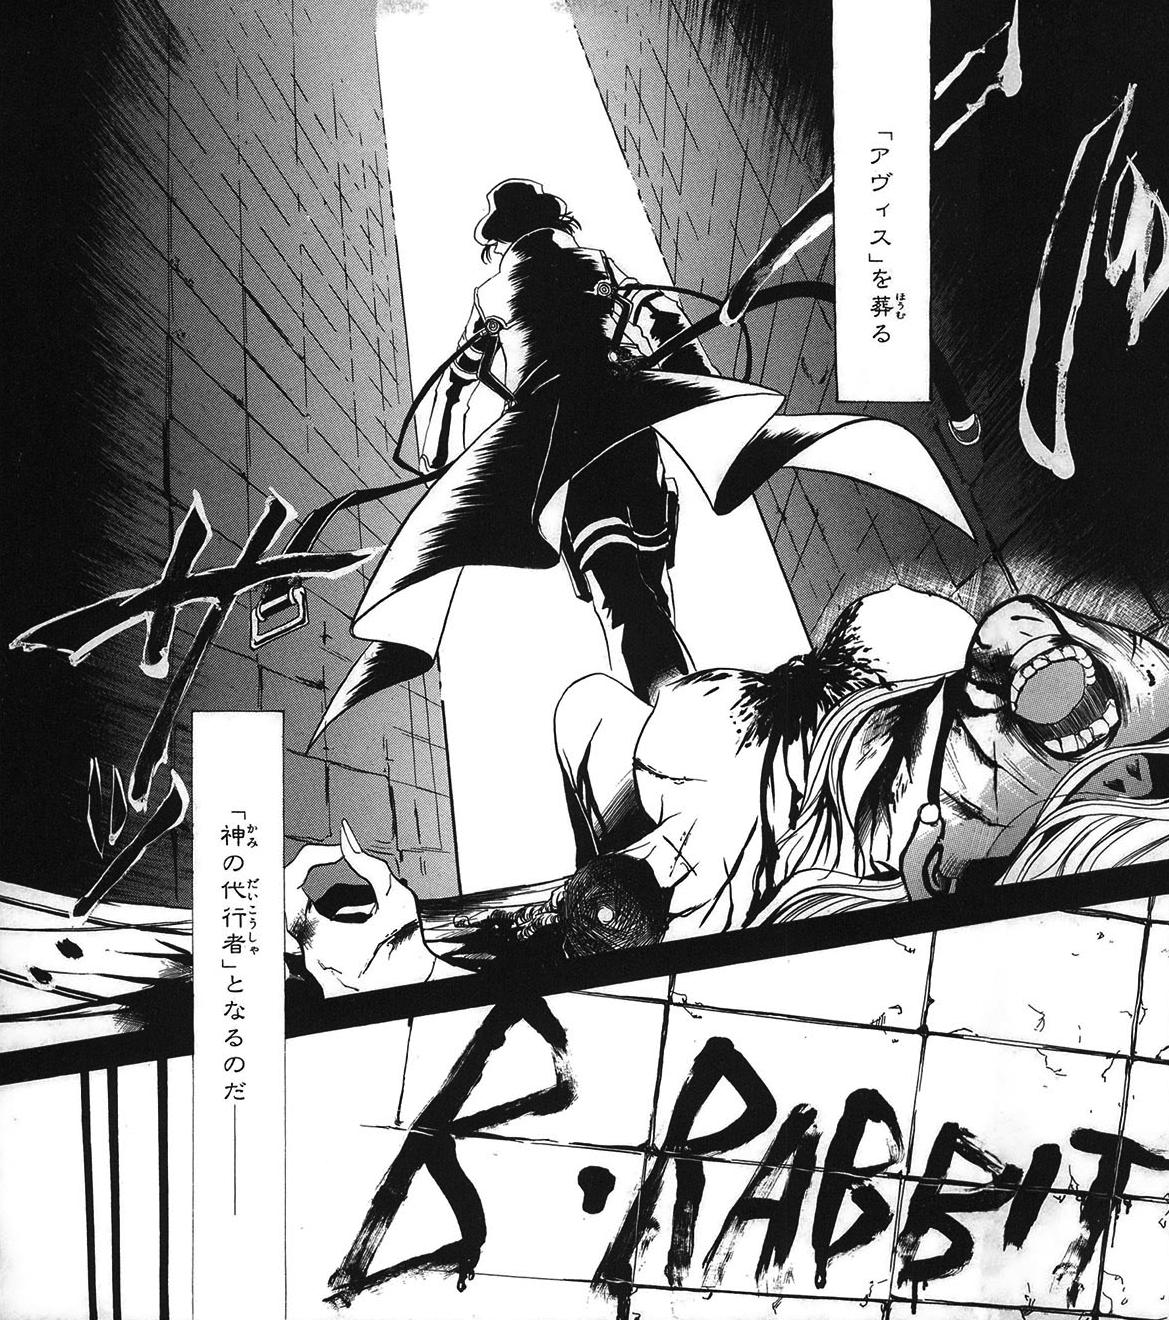 Datei:B-Rabbit.png